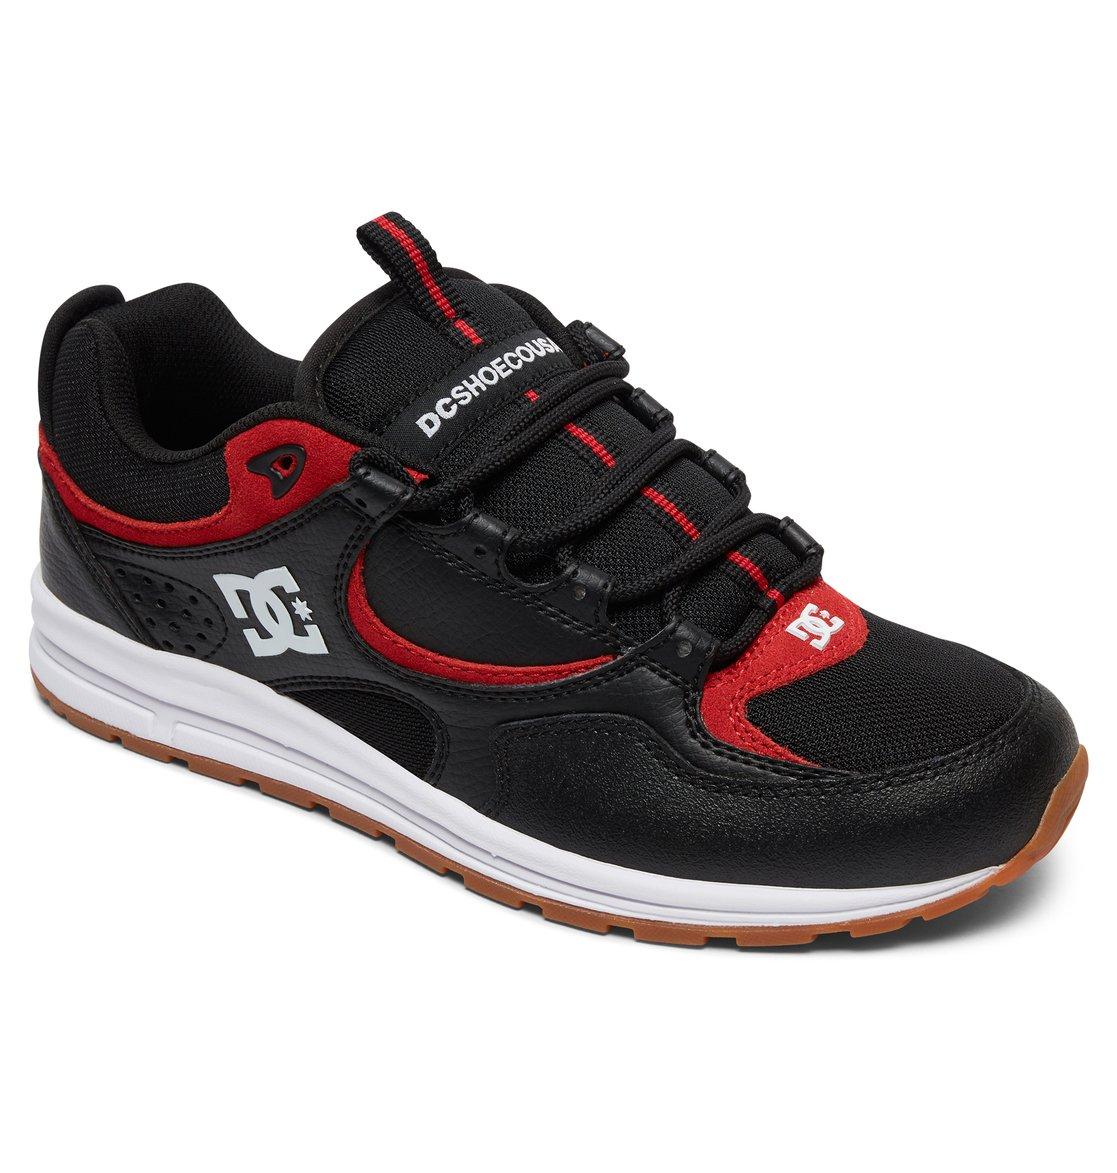 Kalis Lite Shoes Adys100291 Dc D Island Slip On British Comfort Leather Dark Brown 1 Black